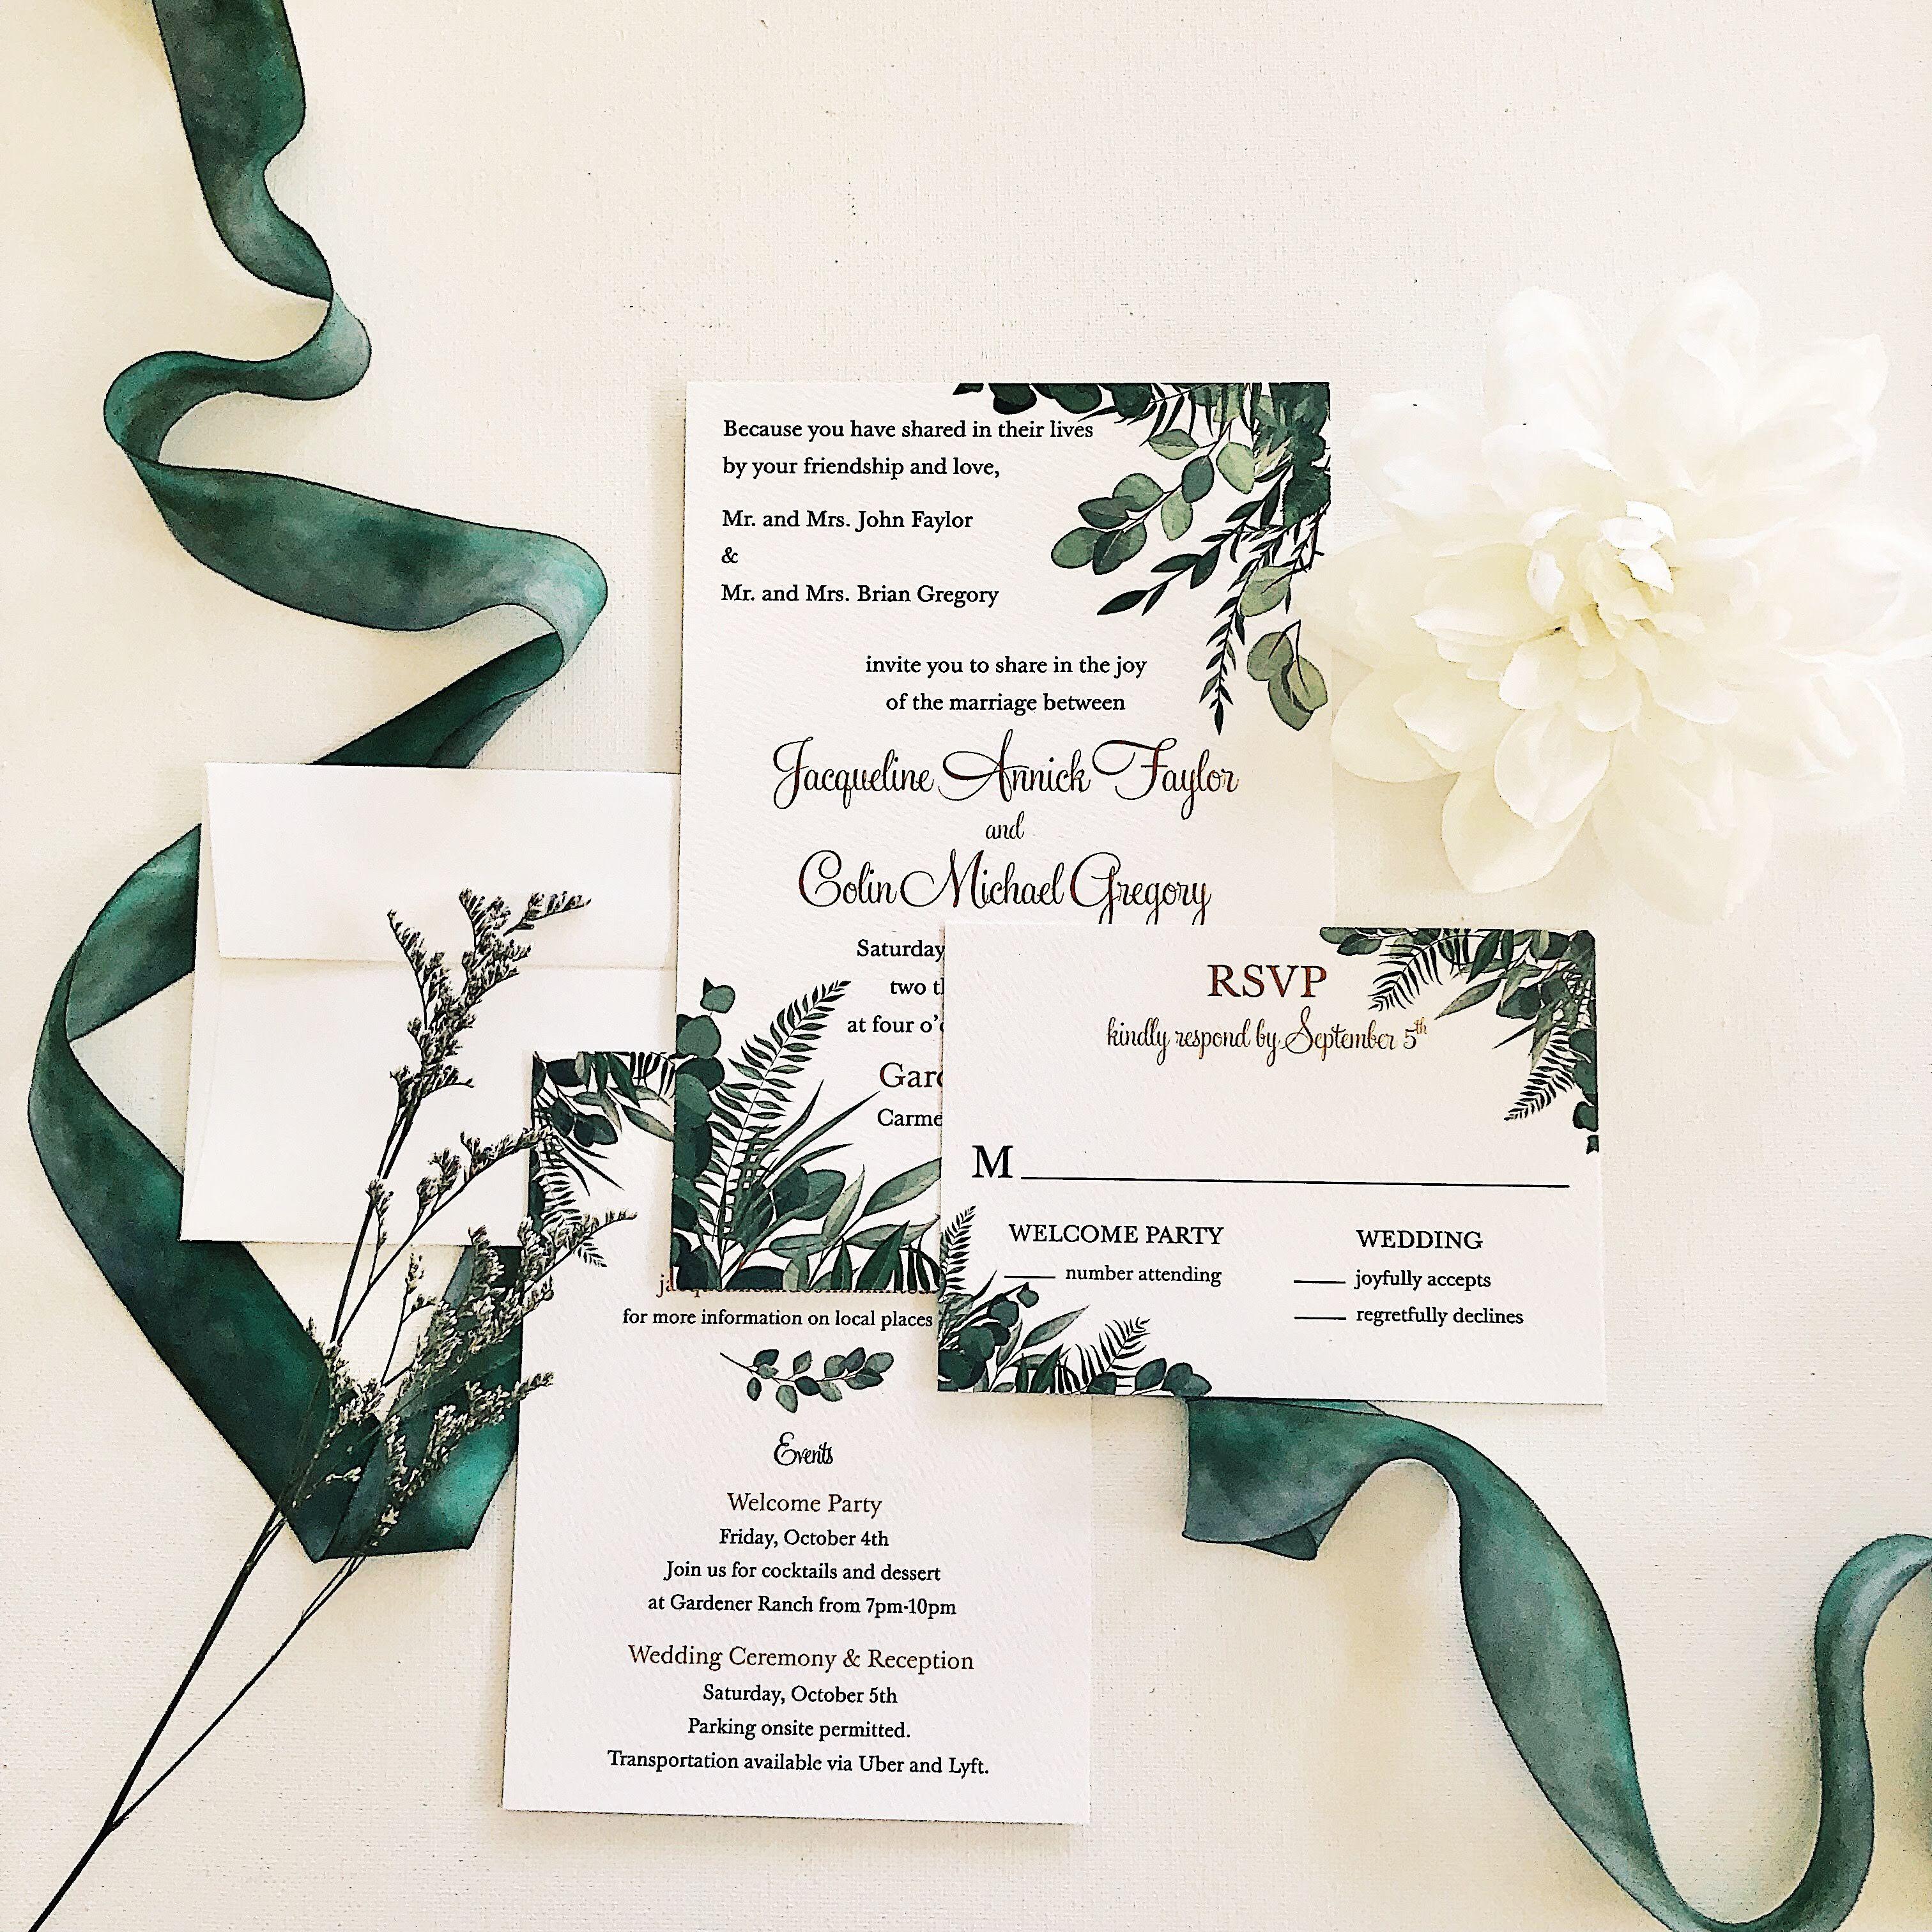 Dark Green Decorative Greenery And Eucalyptus With Elegant Font